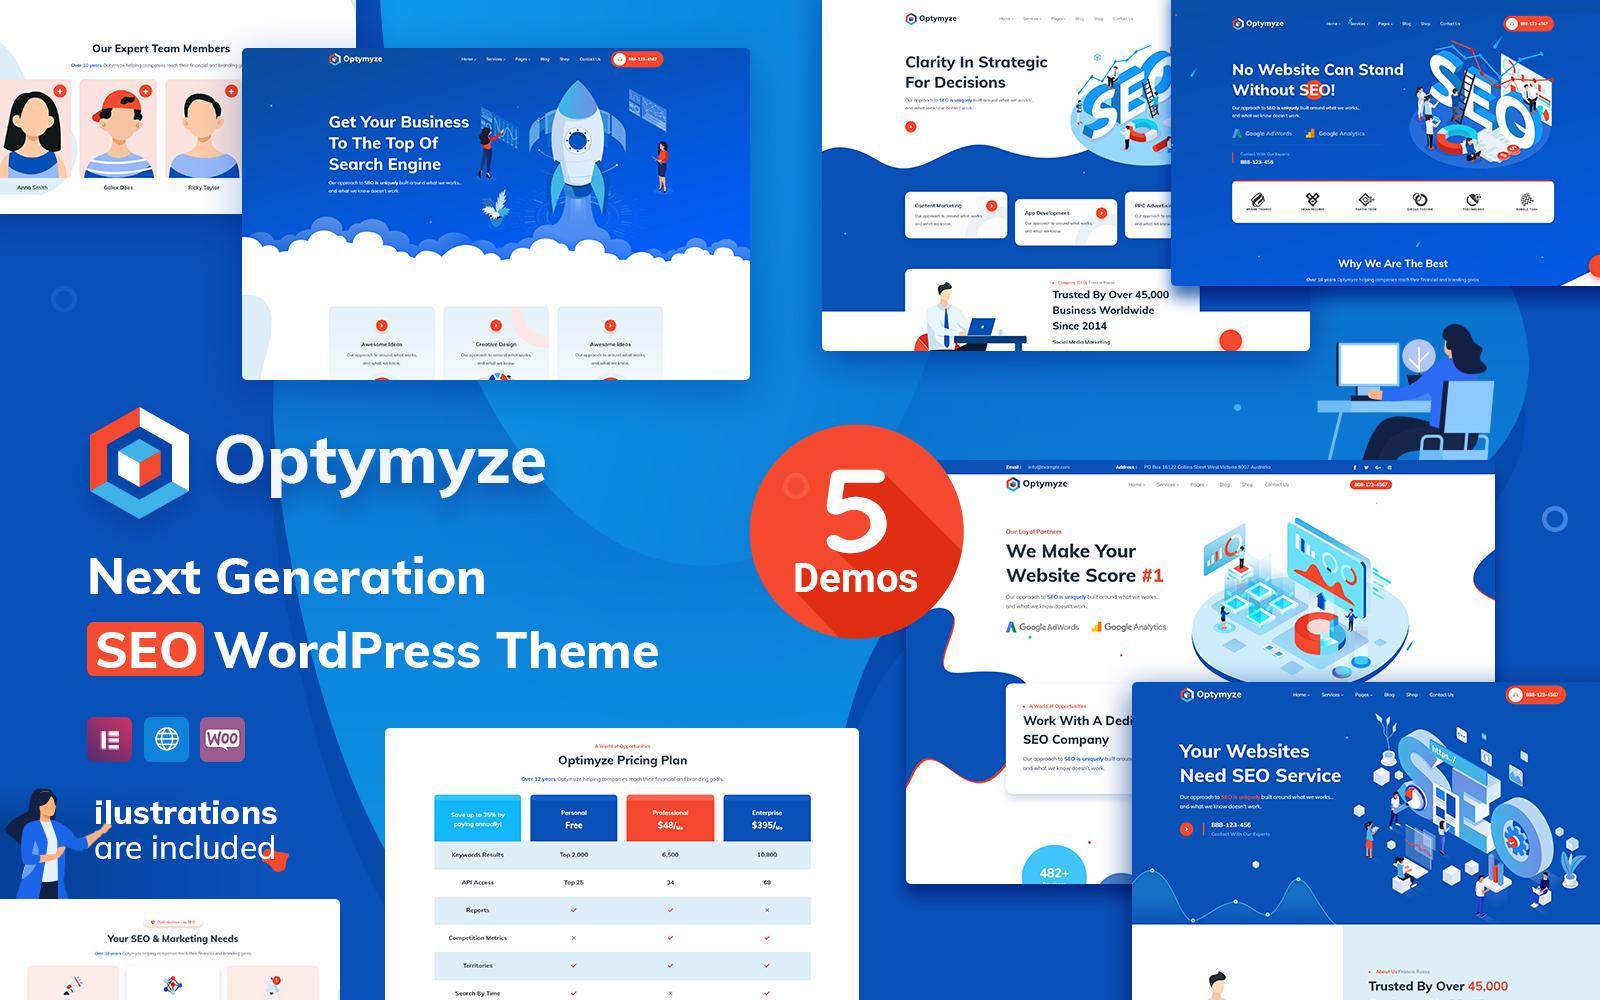 Optymyze - SEO WordPress Theme